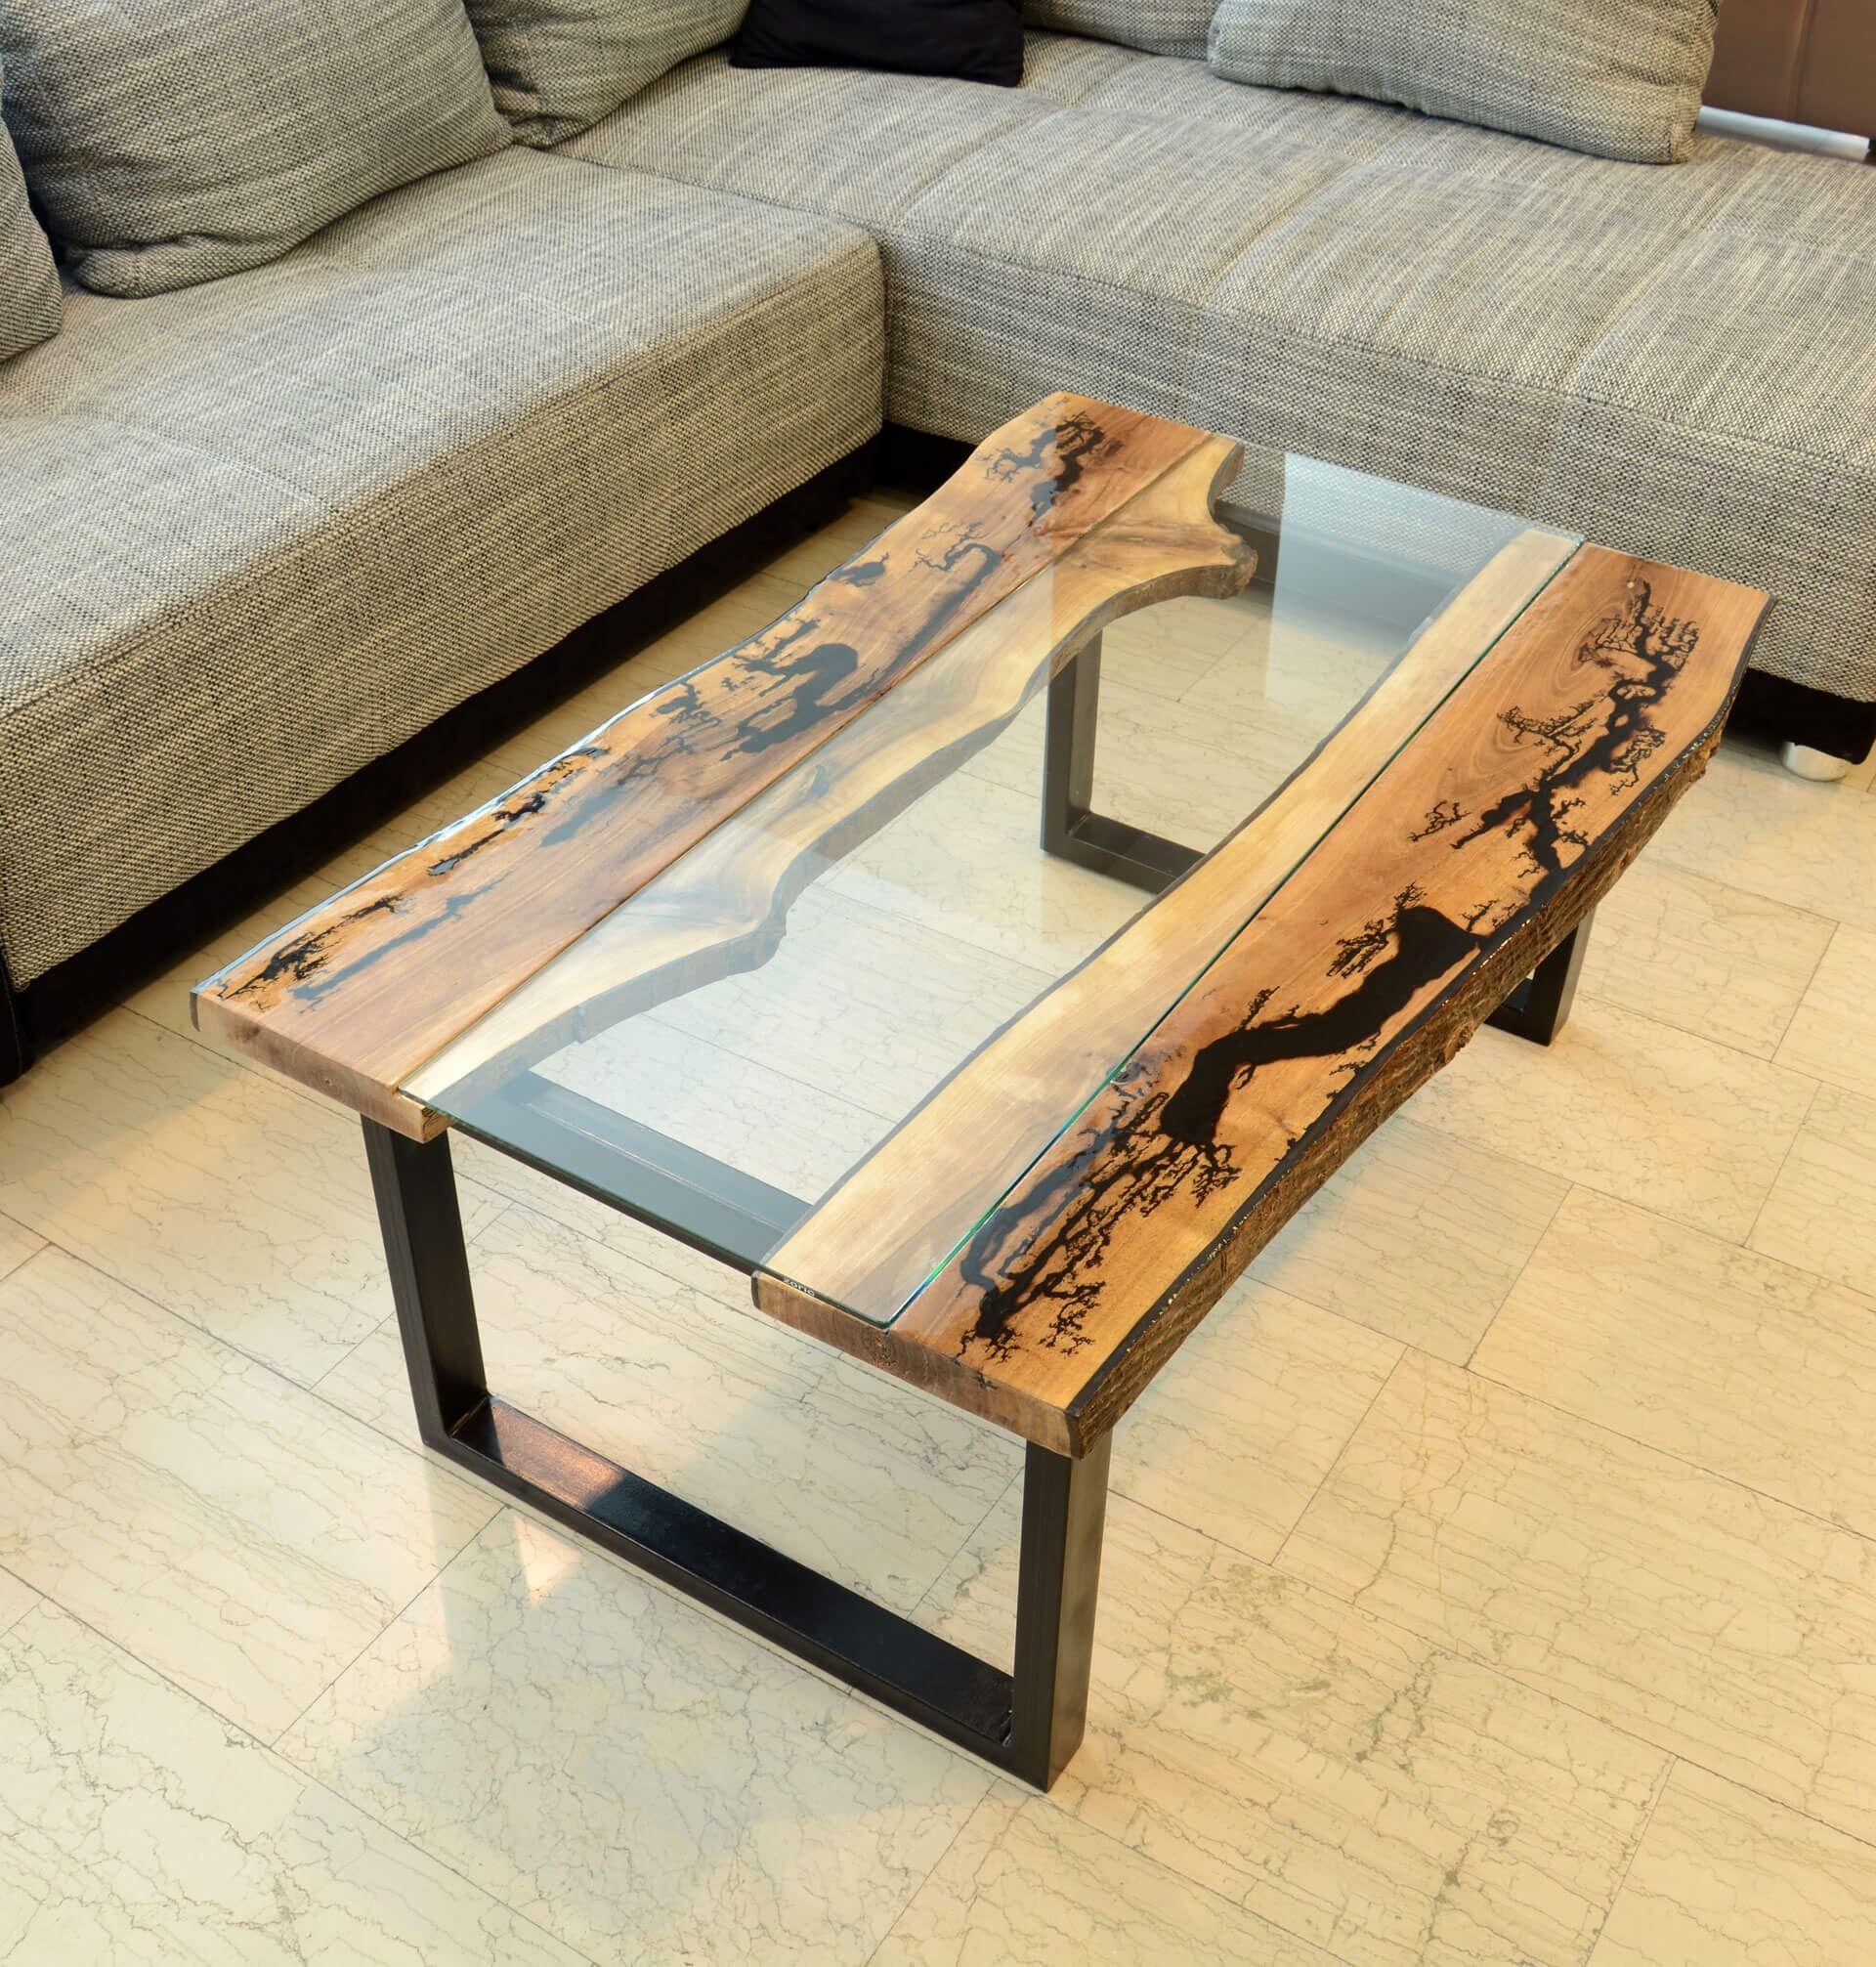 Walnut Wood Burn Glass Coffee Table Coffee Table Table Painting Wood Furniture [ 2013 x 1920 Pixel ]